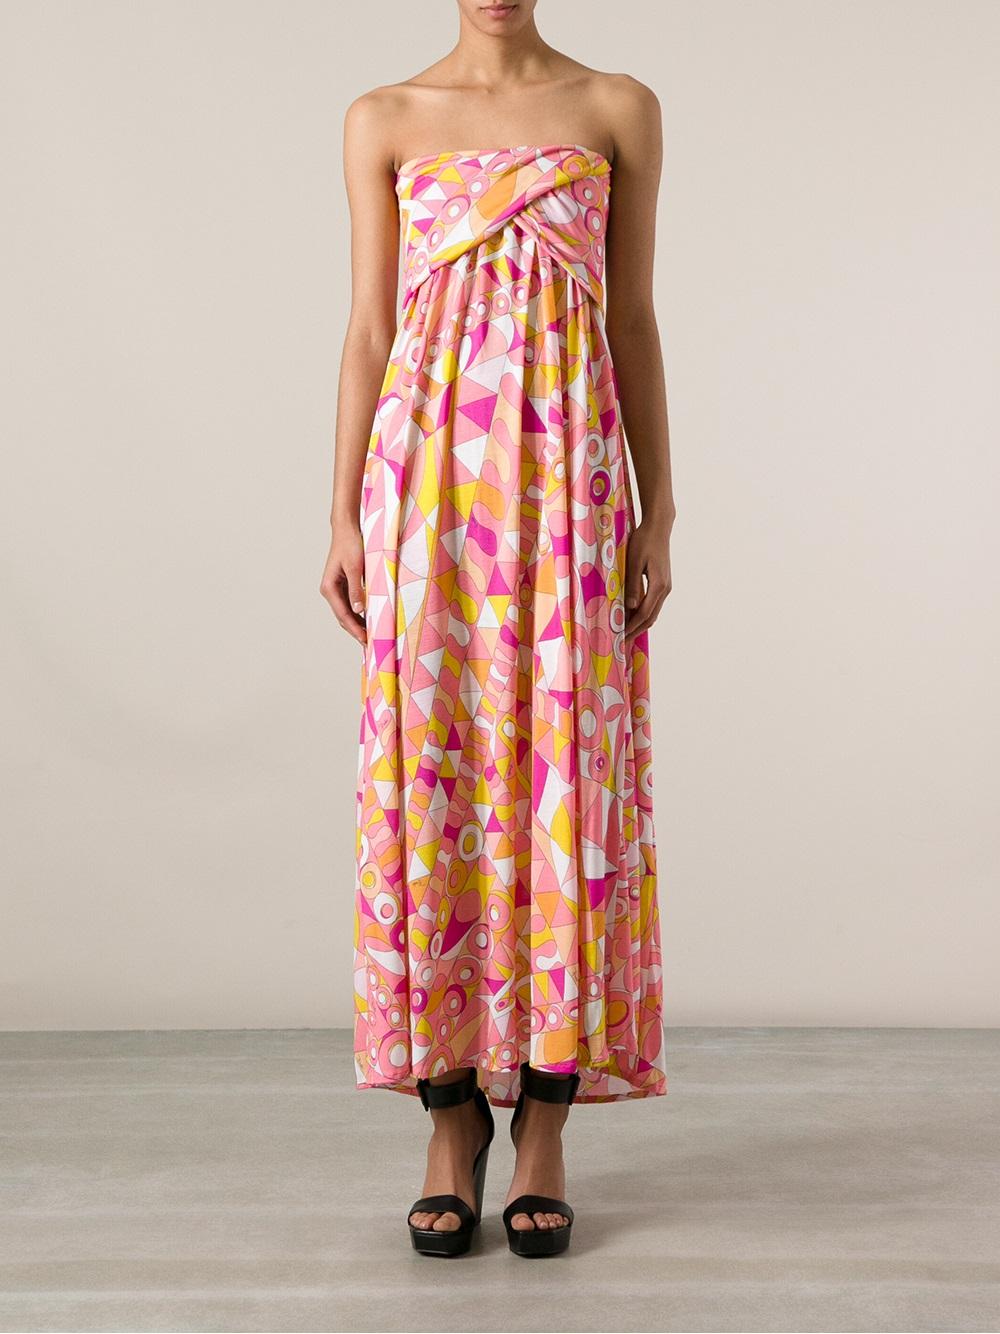 Emilio Pucci Printed Maxi Dress in Pink & Purple (Pink)